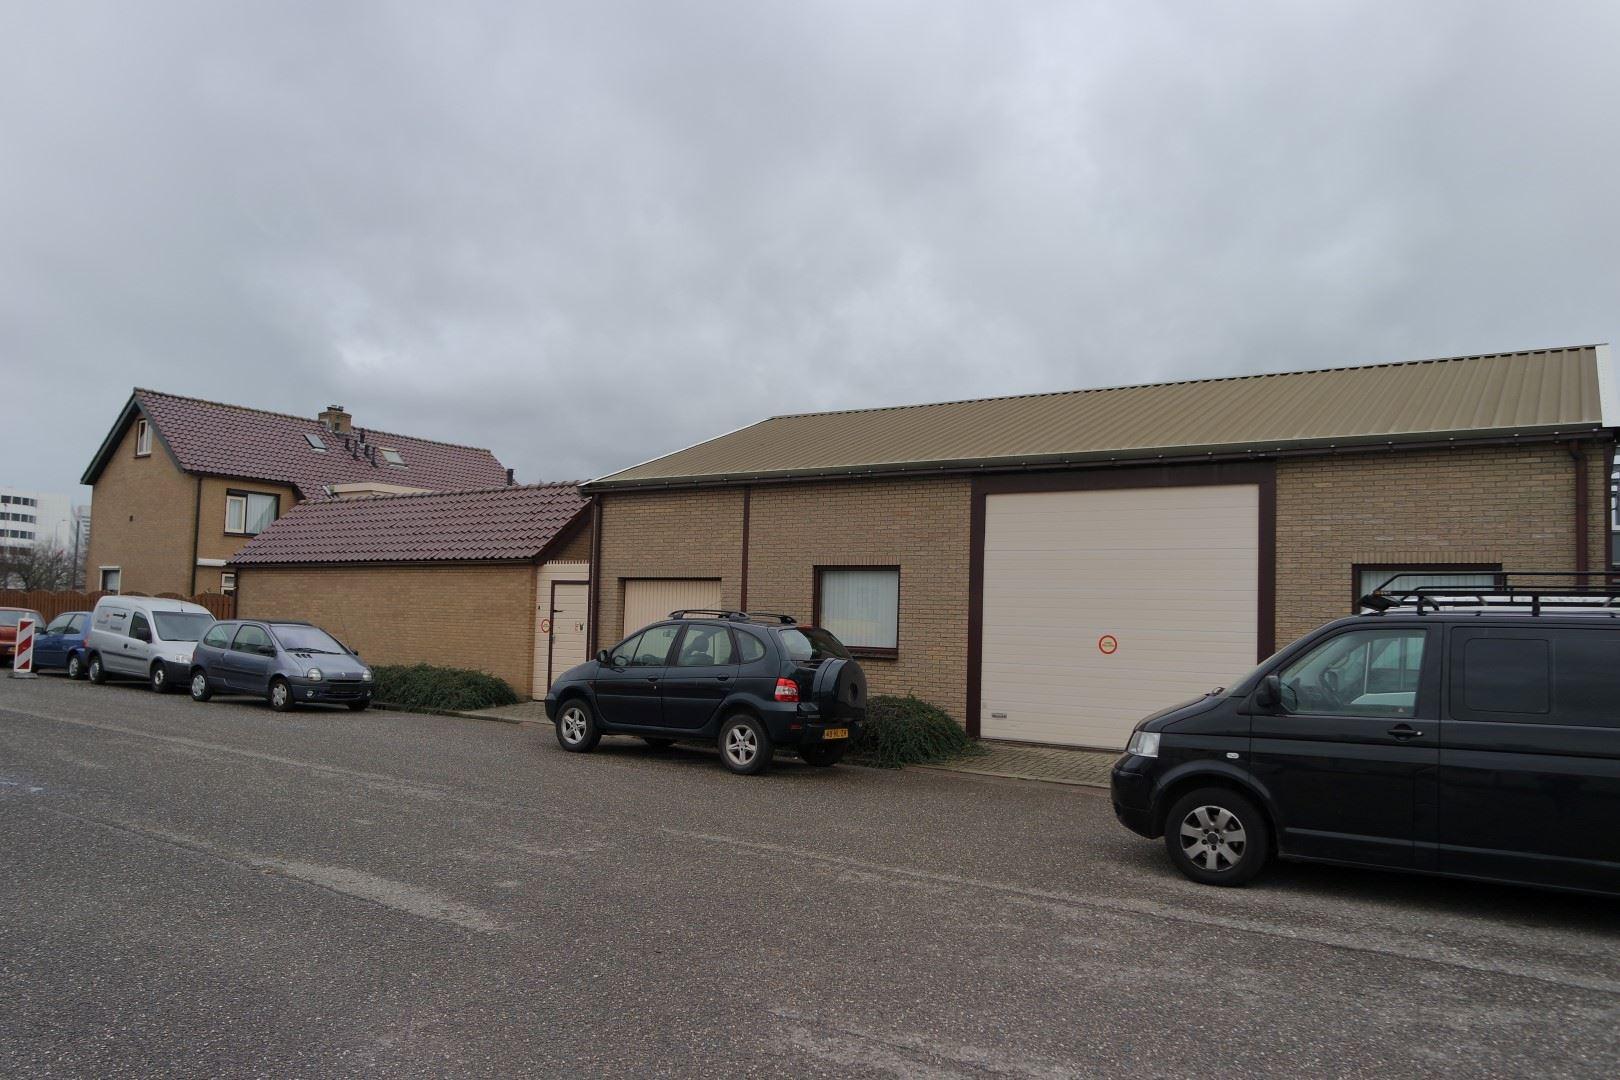 Huis te koop kruisweg 767 2132 ng hoofddorp funda for Koopwoningen